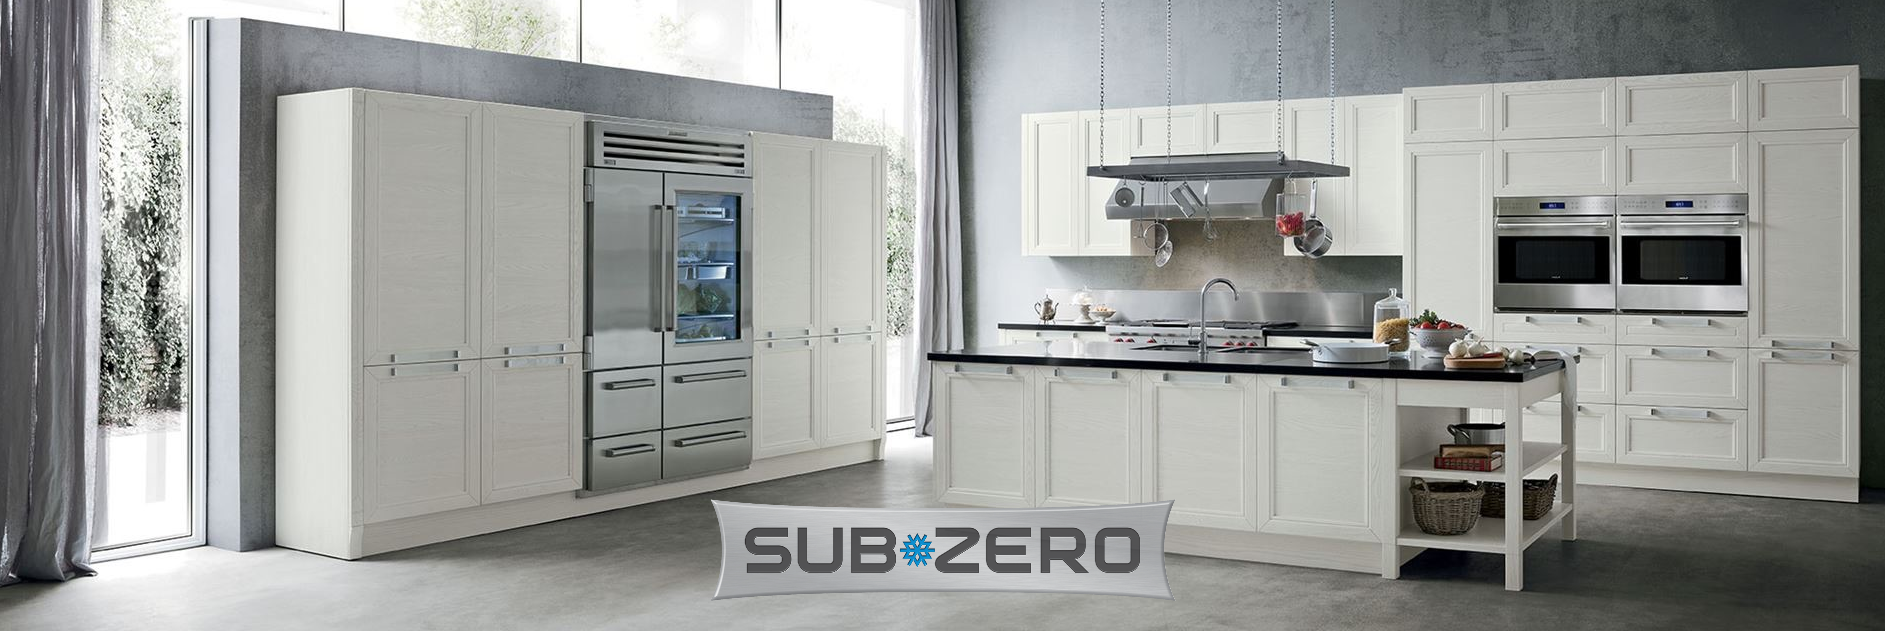 sub zero Sale